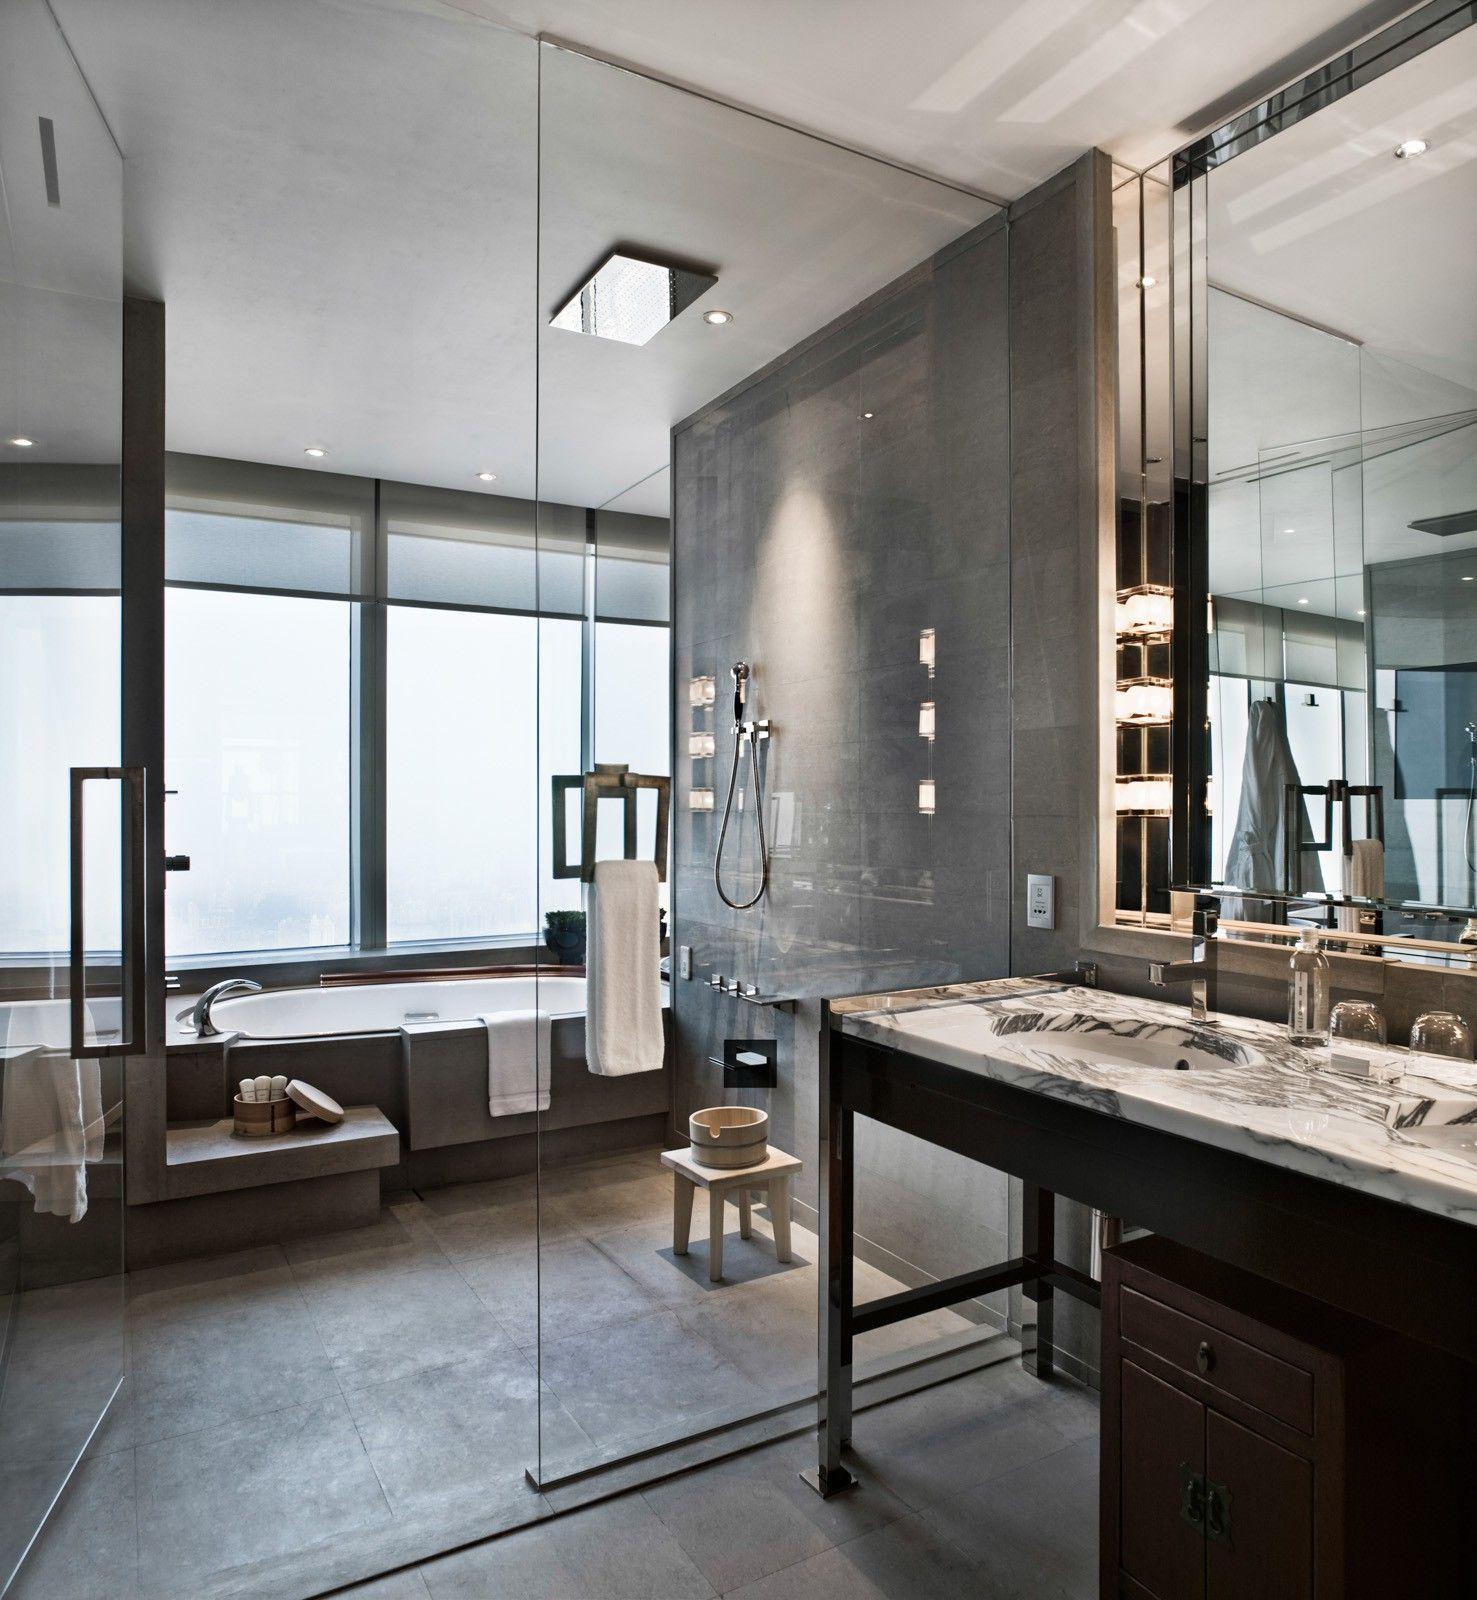 Marchay Travel Membership Programme Home Bathroom Decor Themes Diy Bathroom Decor